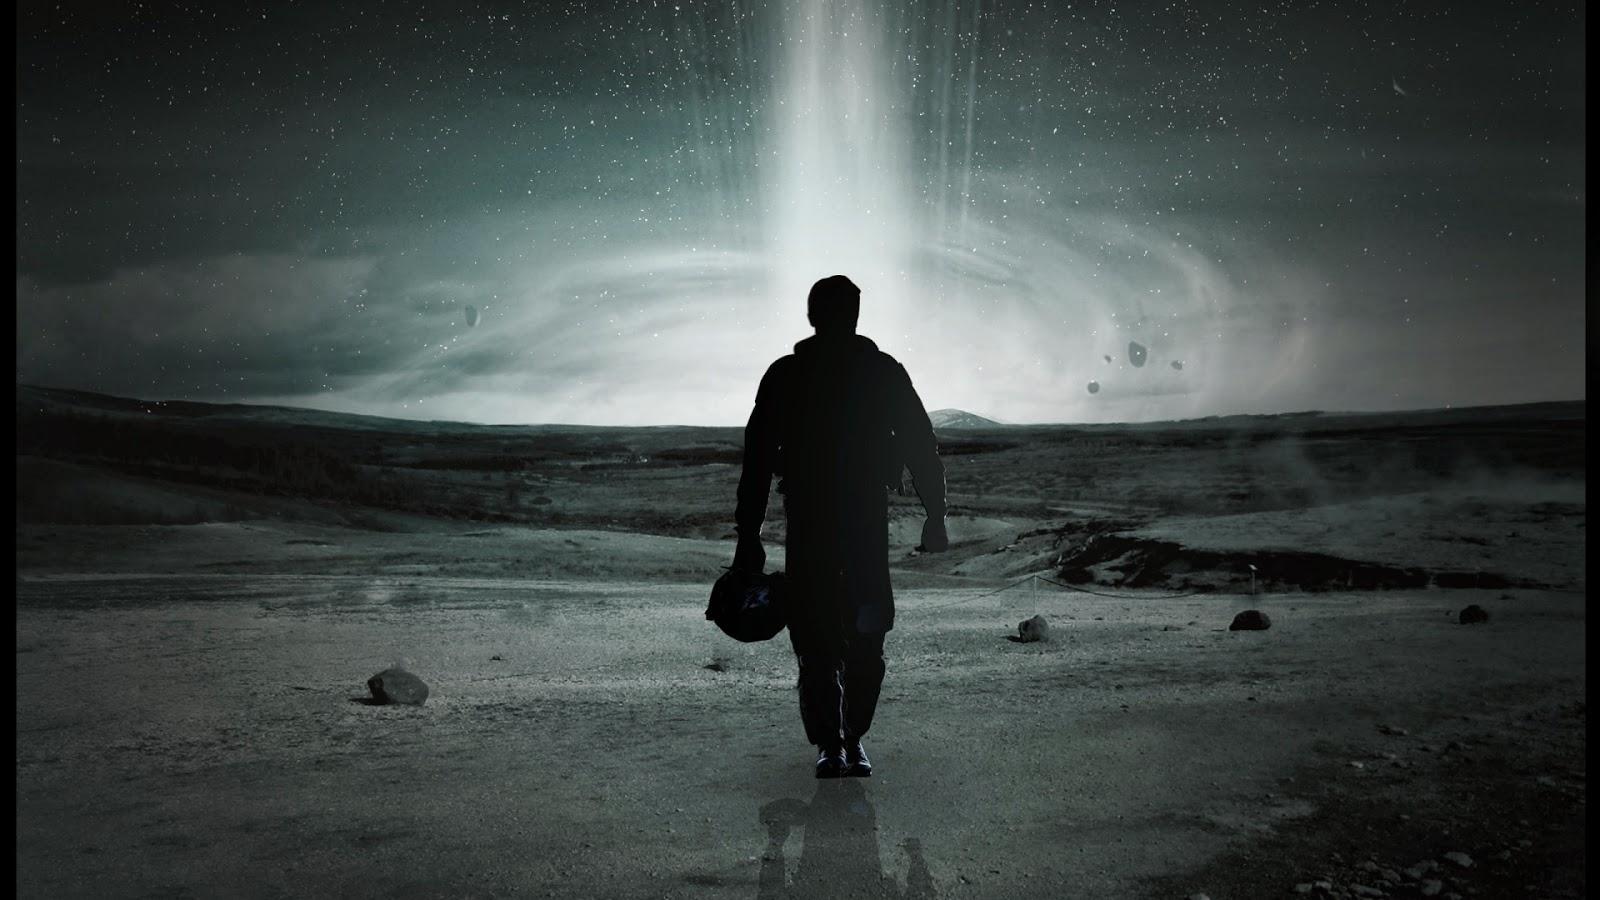 christopher nolans interstellar wallpapers - Interstellar Posters Wallpapers & Behind the Scenes